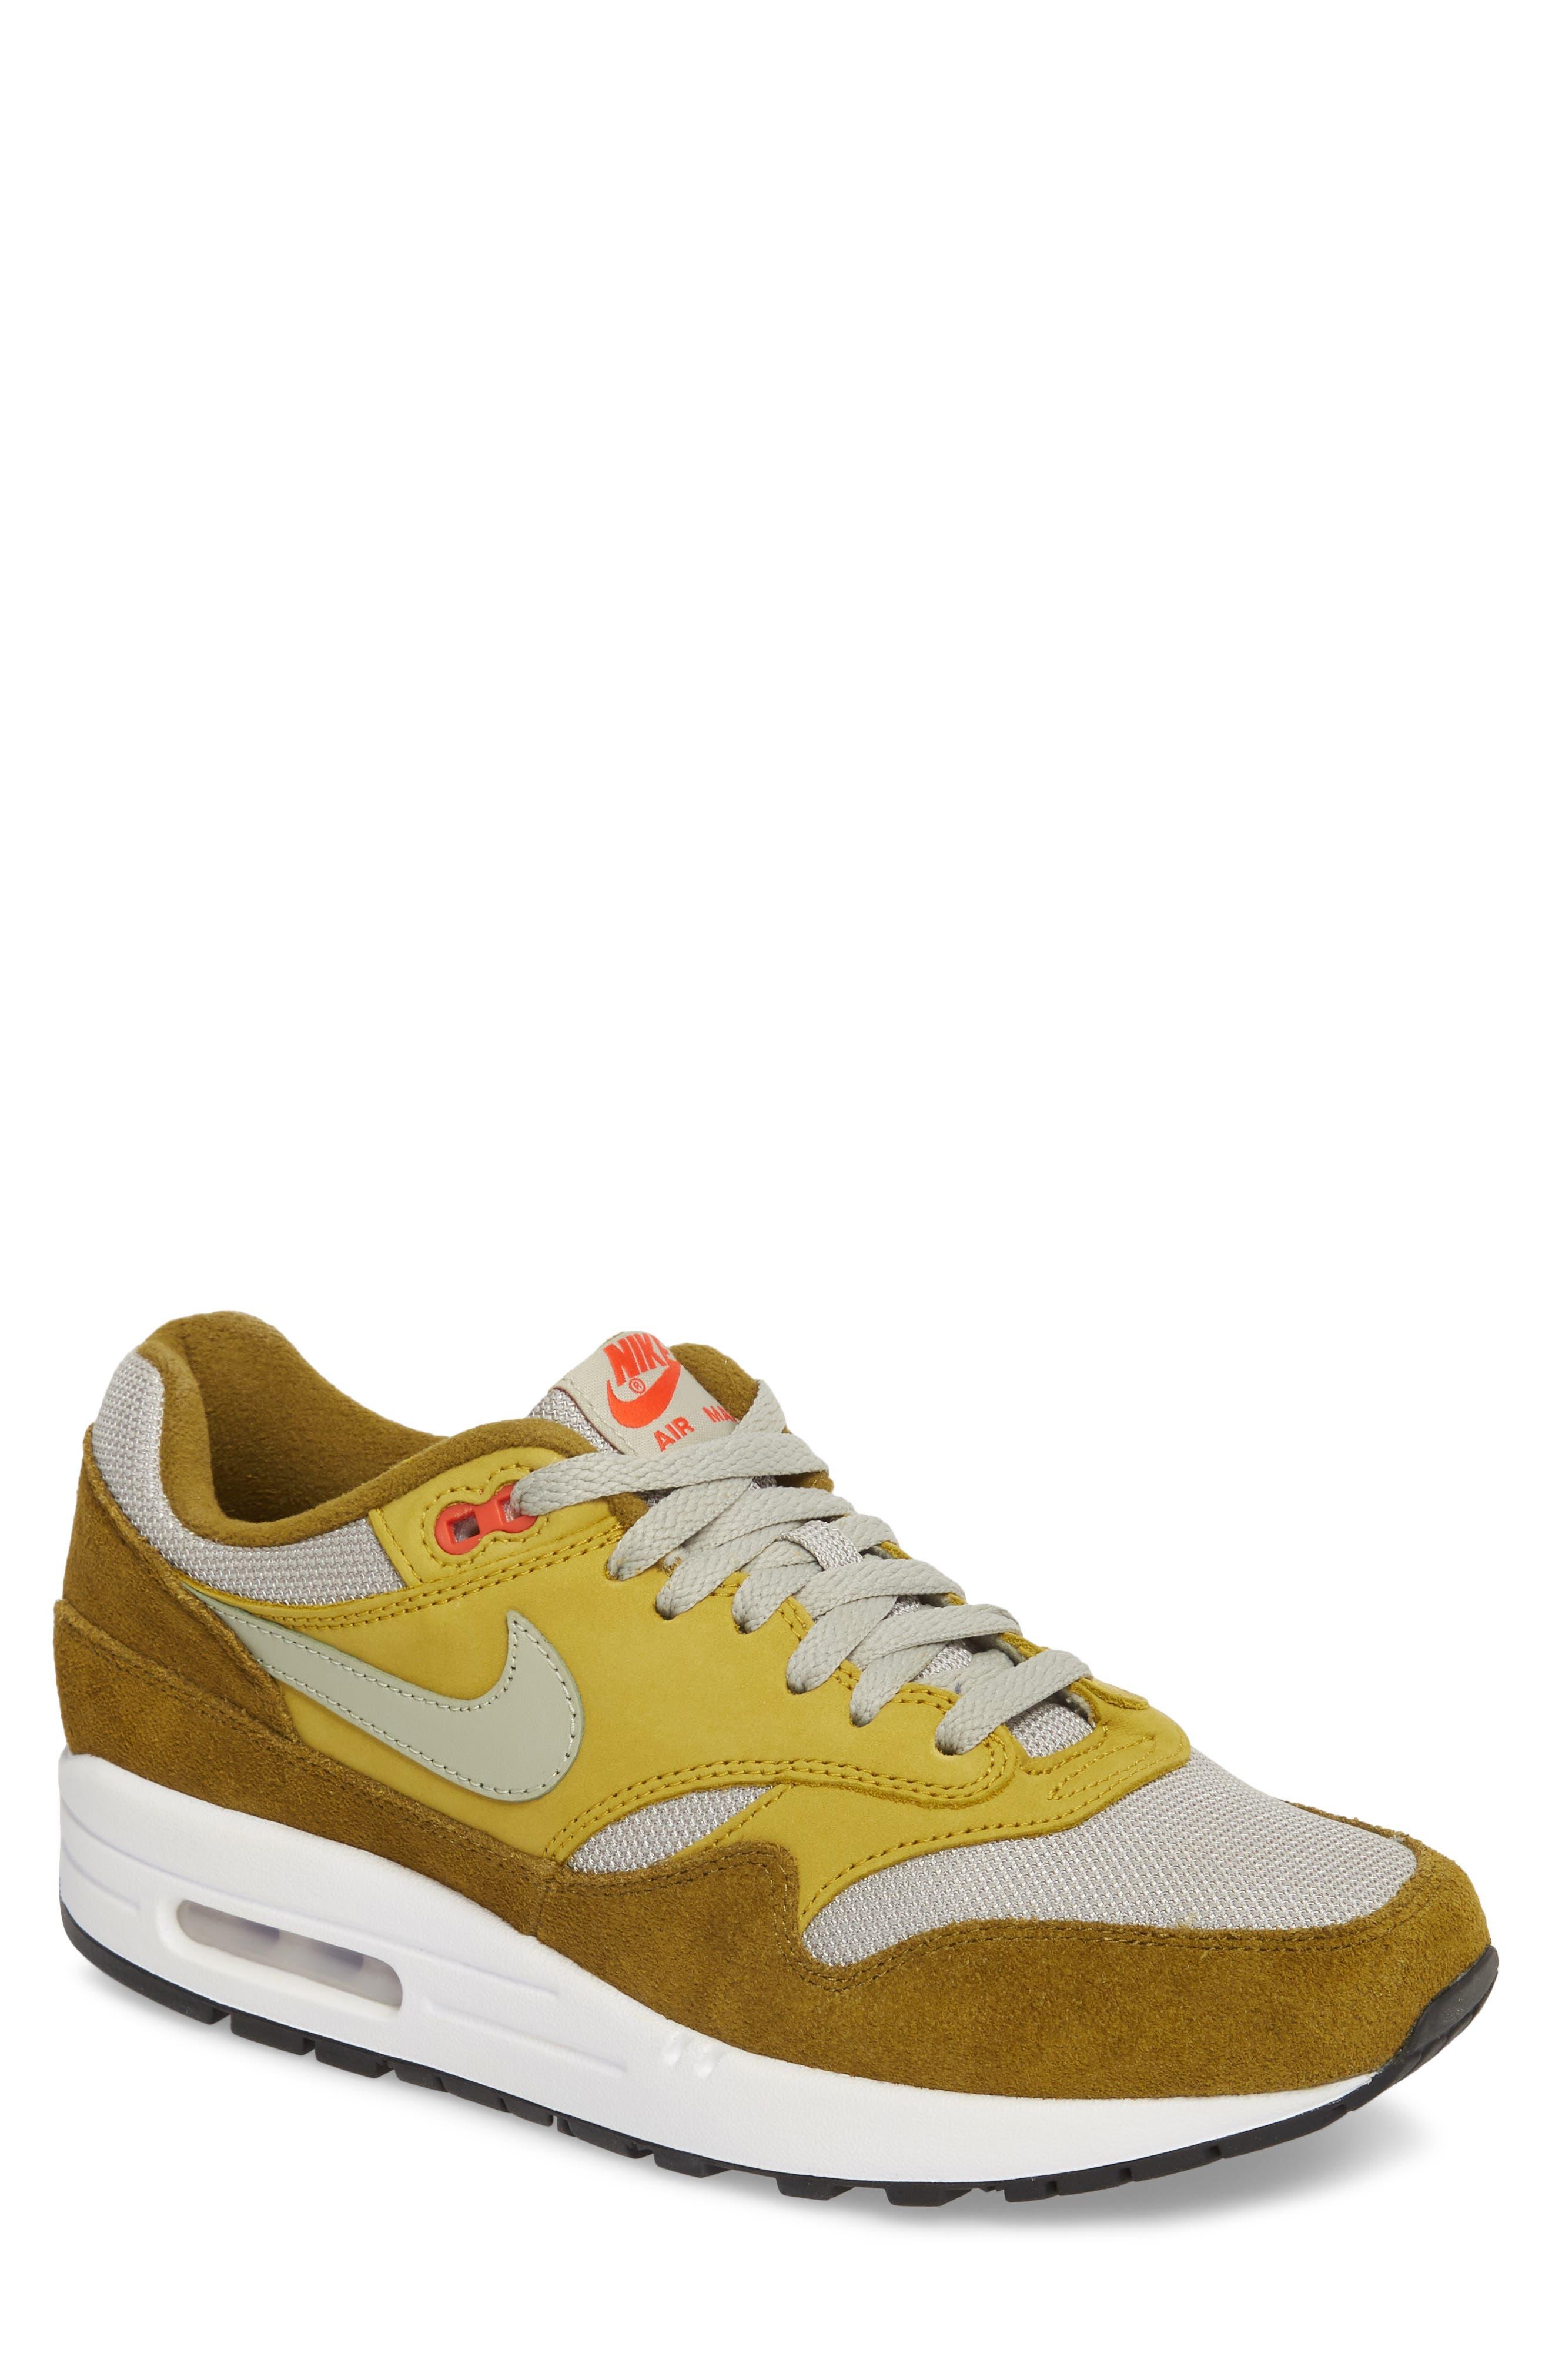 Air Max 1 Premium Retro Sneaker,                         Main,                         color,